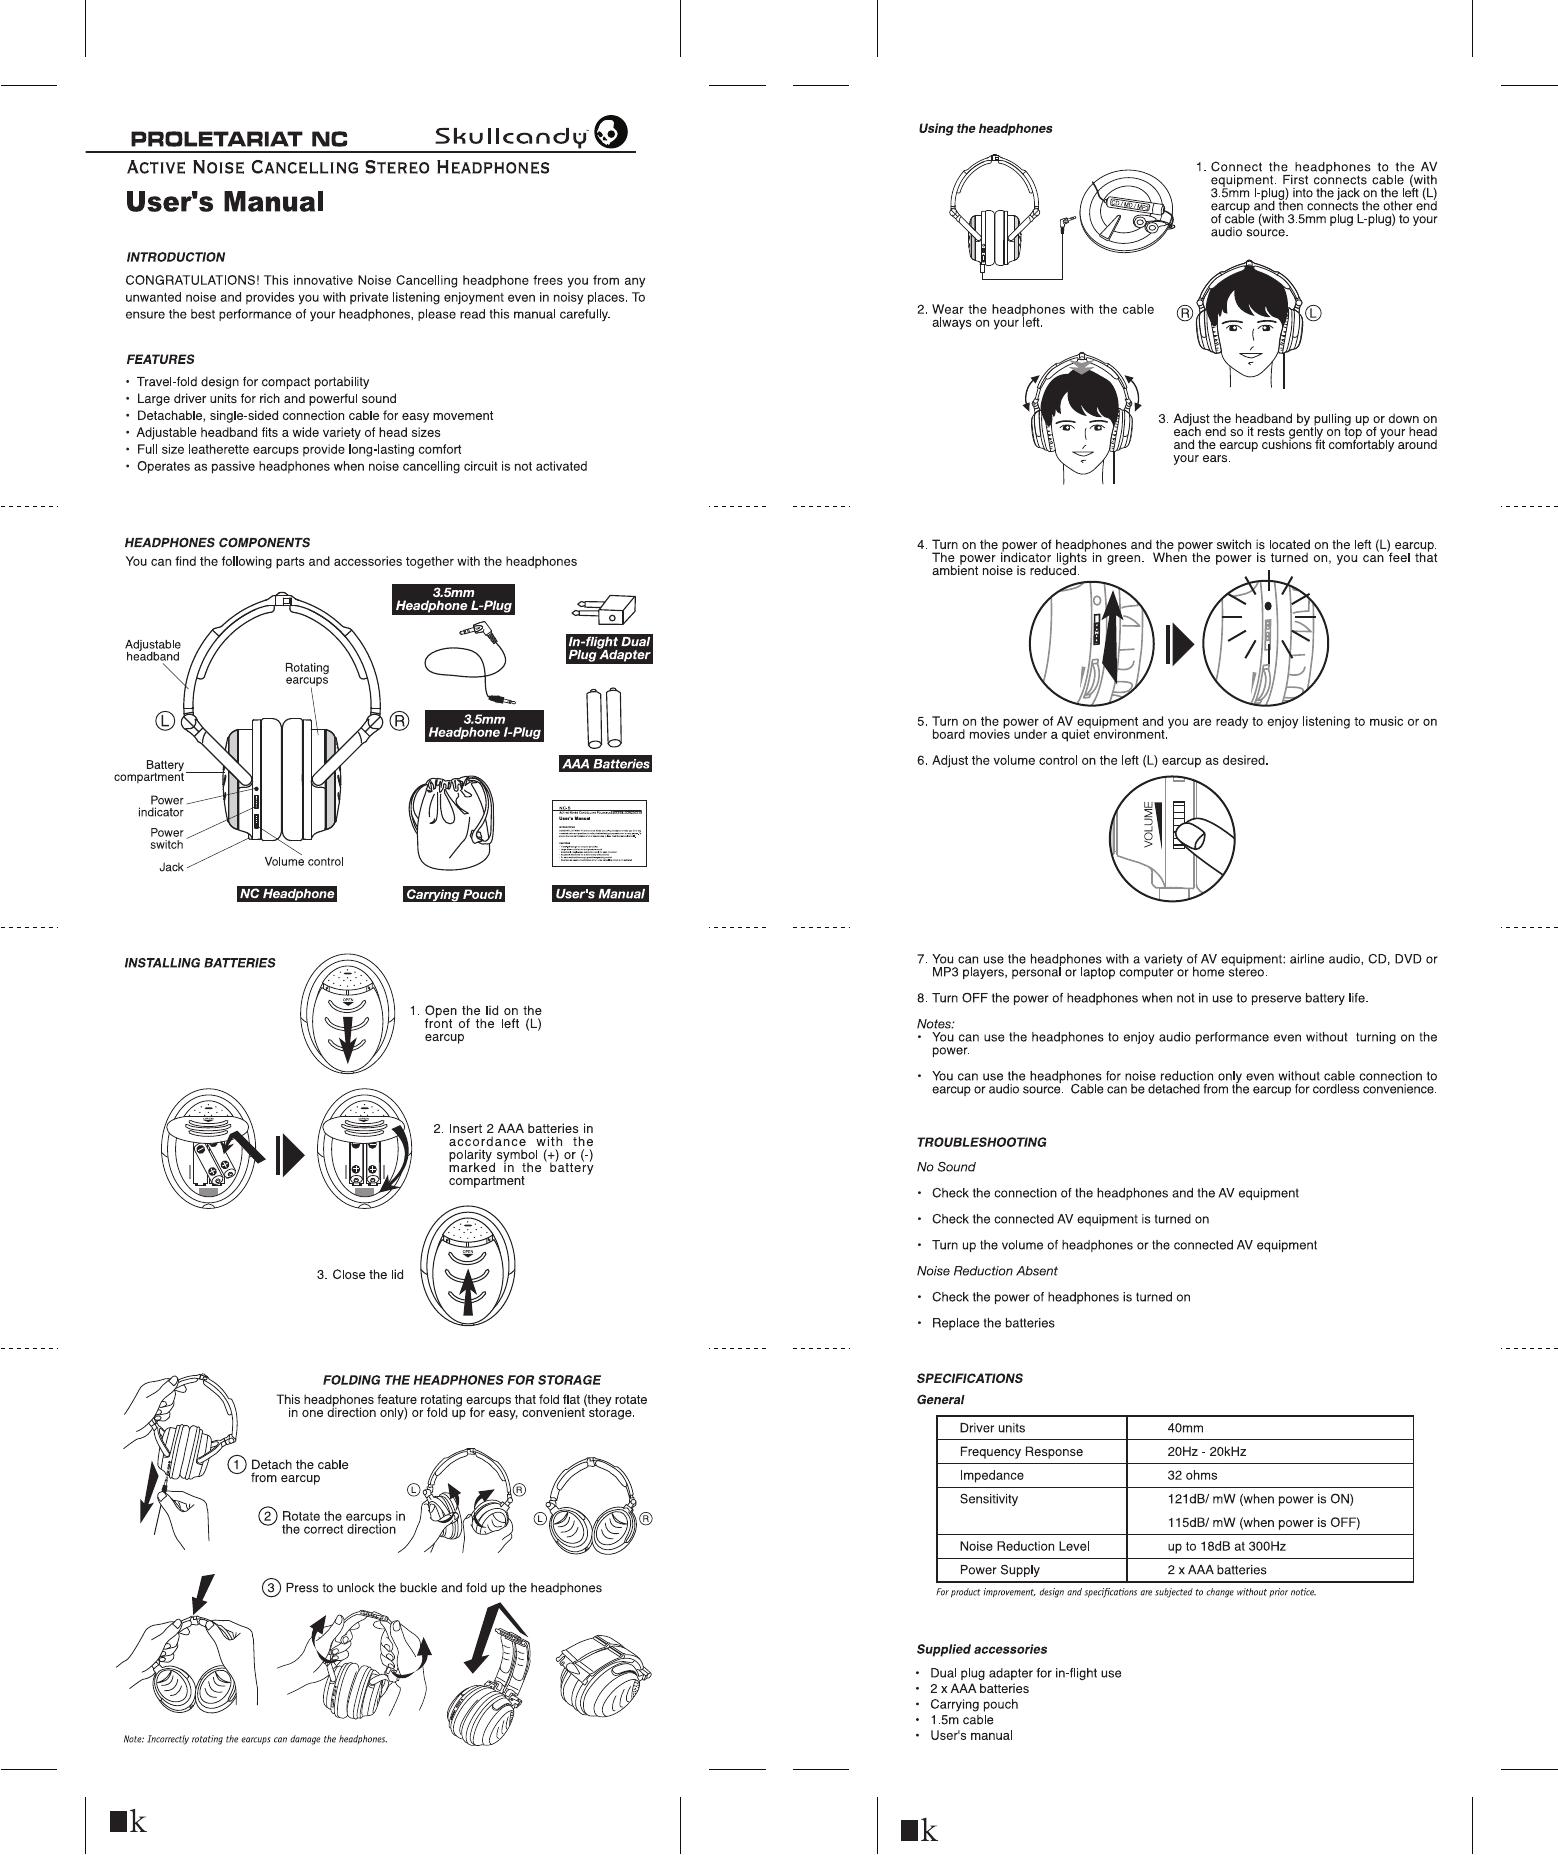 Refrigerator Noises Manual Guide